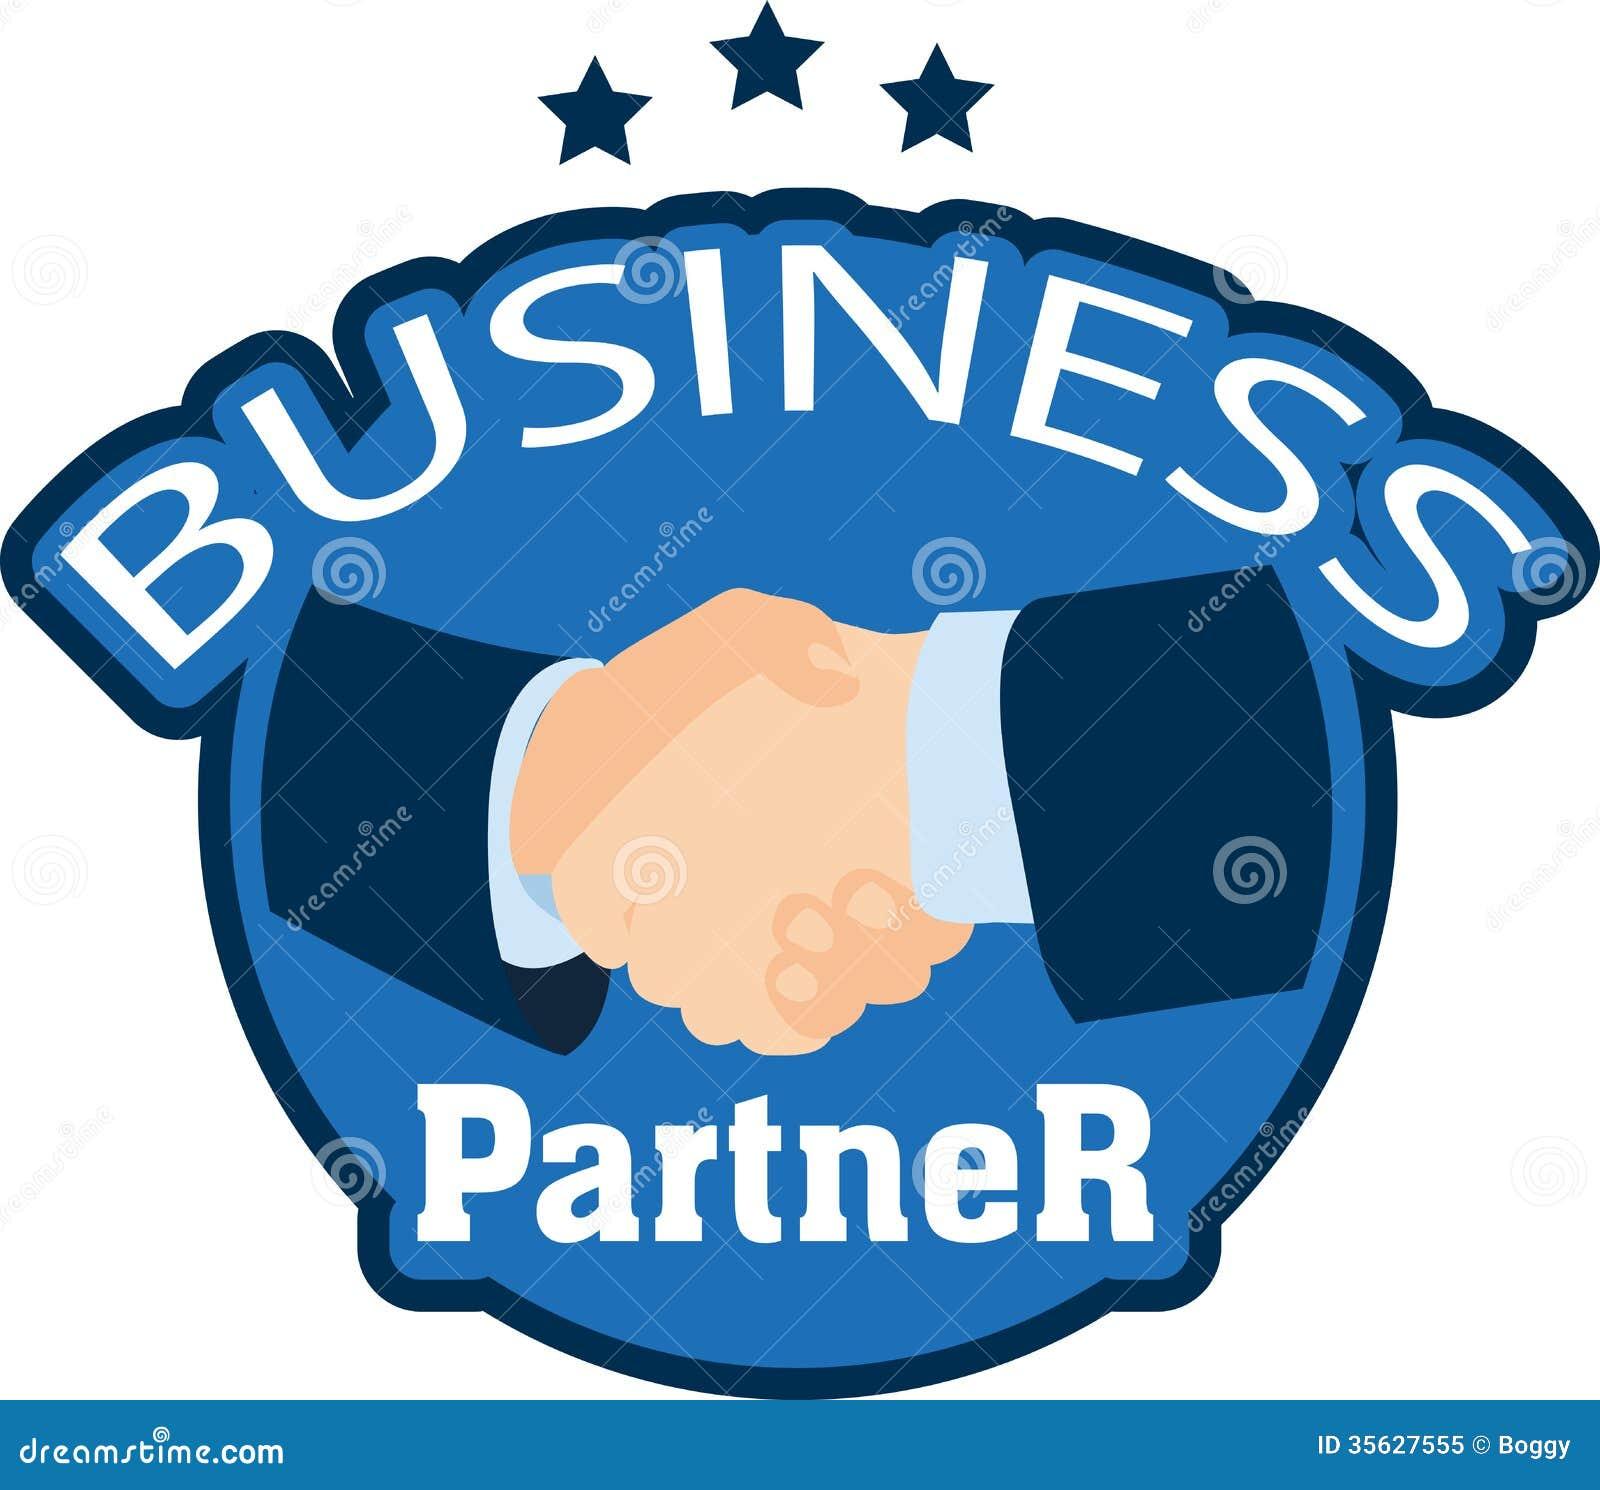 Business Partner Royalty Free Stock Photo Image 35627555